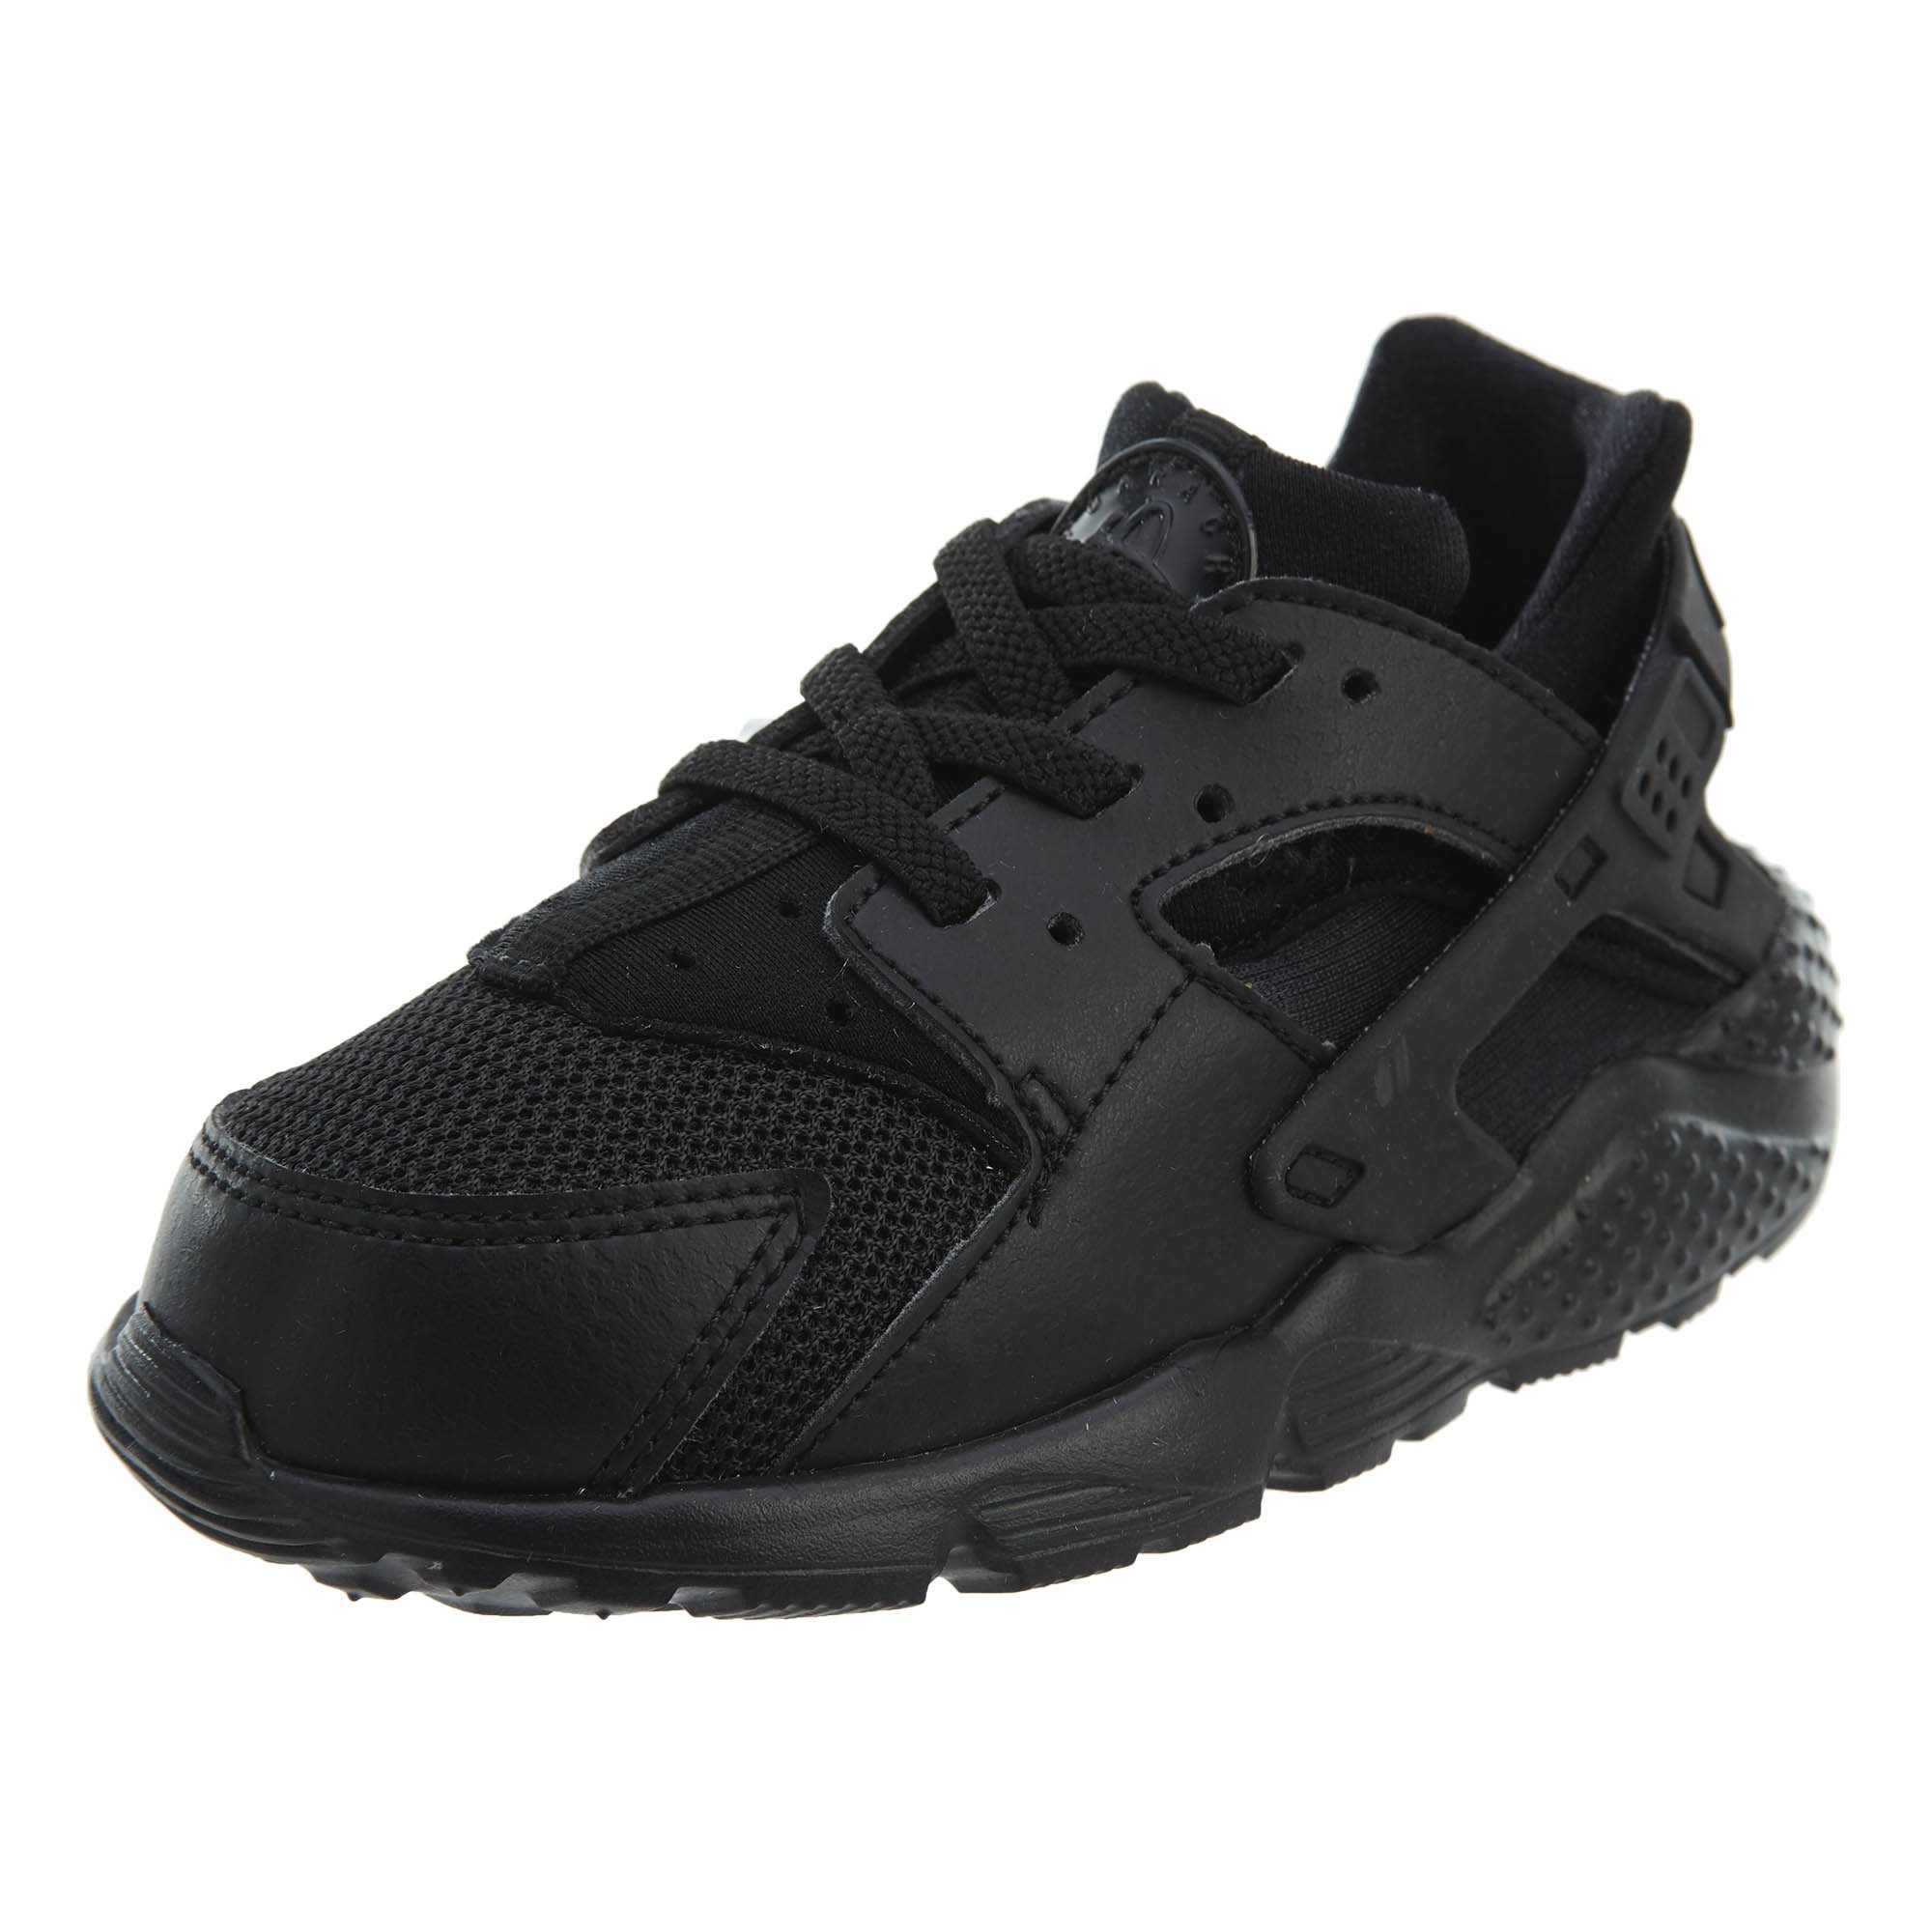 d54add9ec9ab Galleon - Nike Huarache Infant Toddler 704950-016 Black (8c)